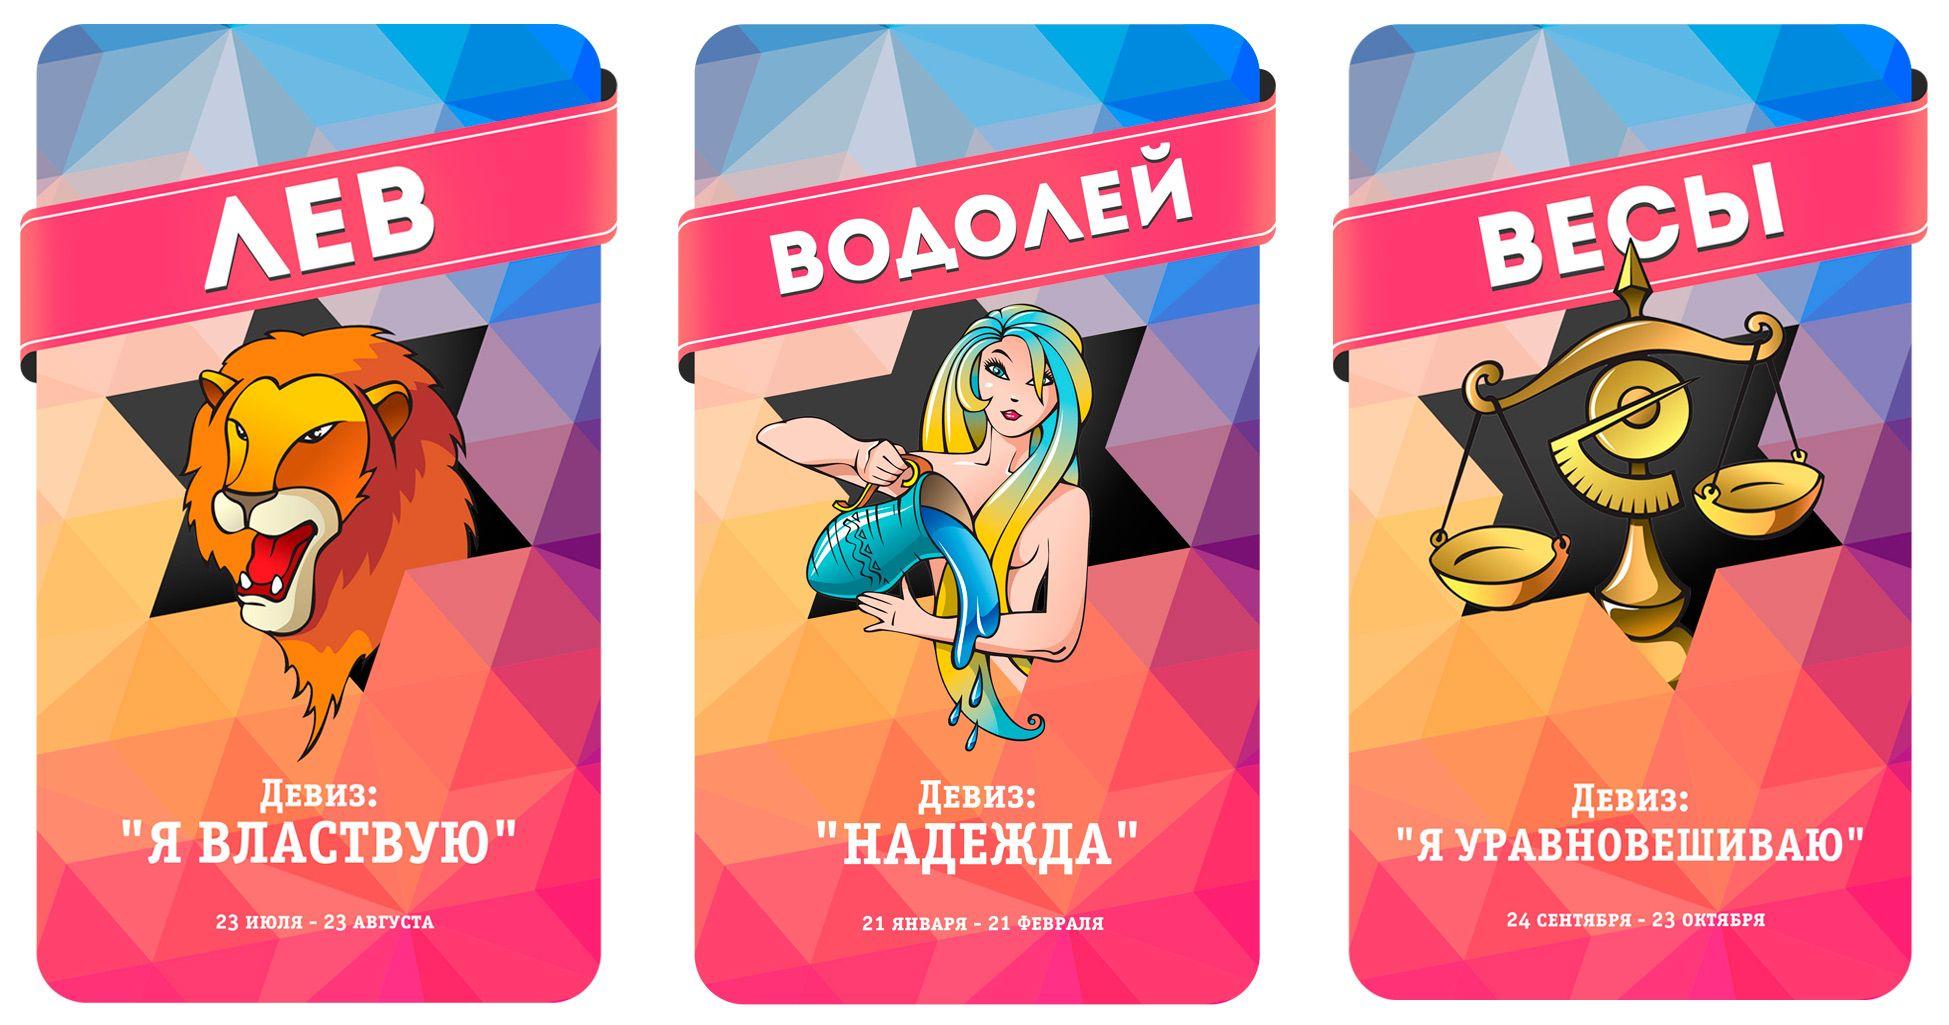 12 автарок + картинки к постам - дизайнер Vladimir_Yevtin